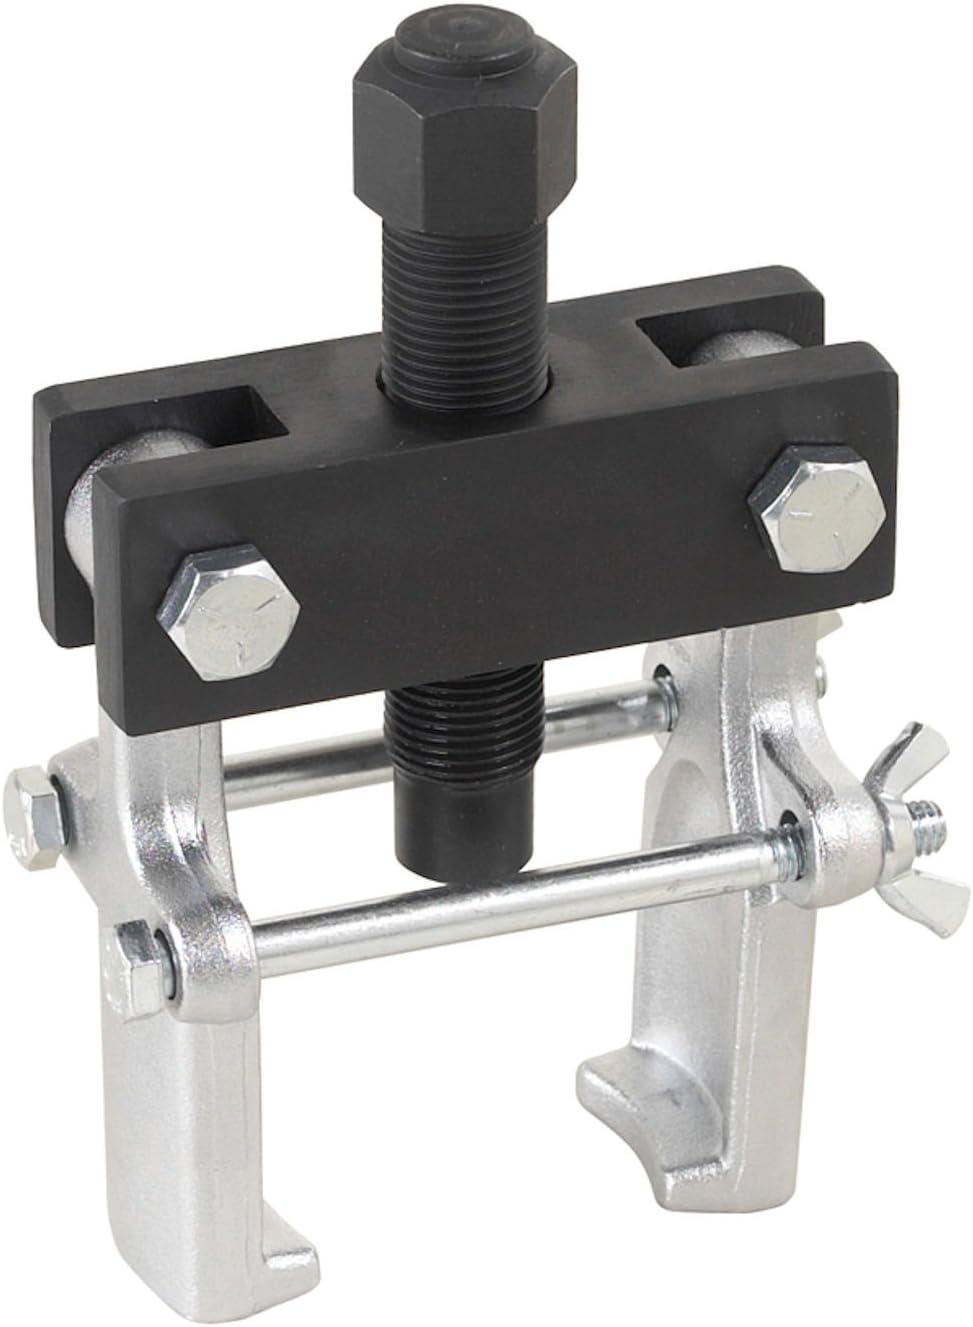 OTC Pitman Arm Puller, Max. Spread 3 1/4 in